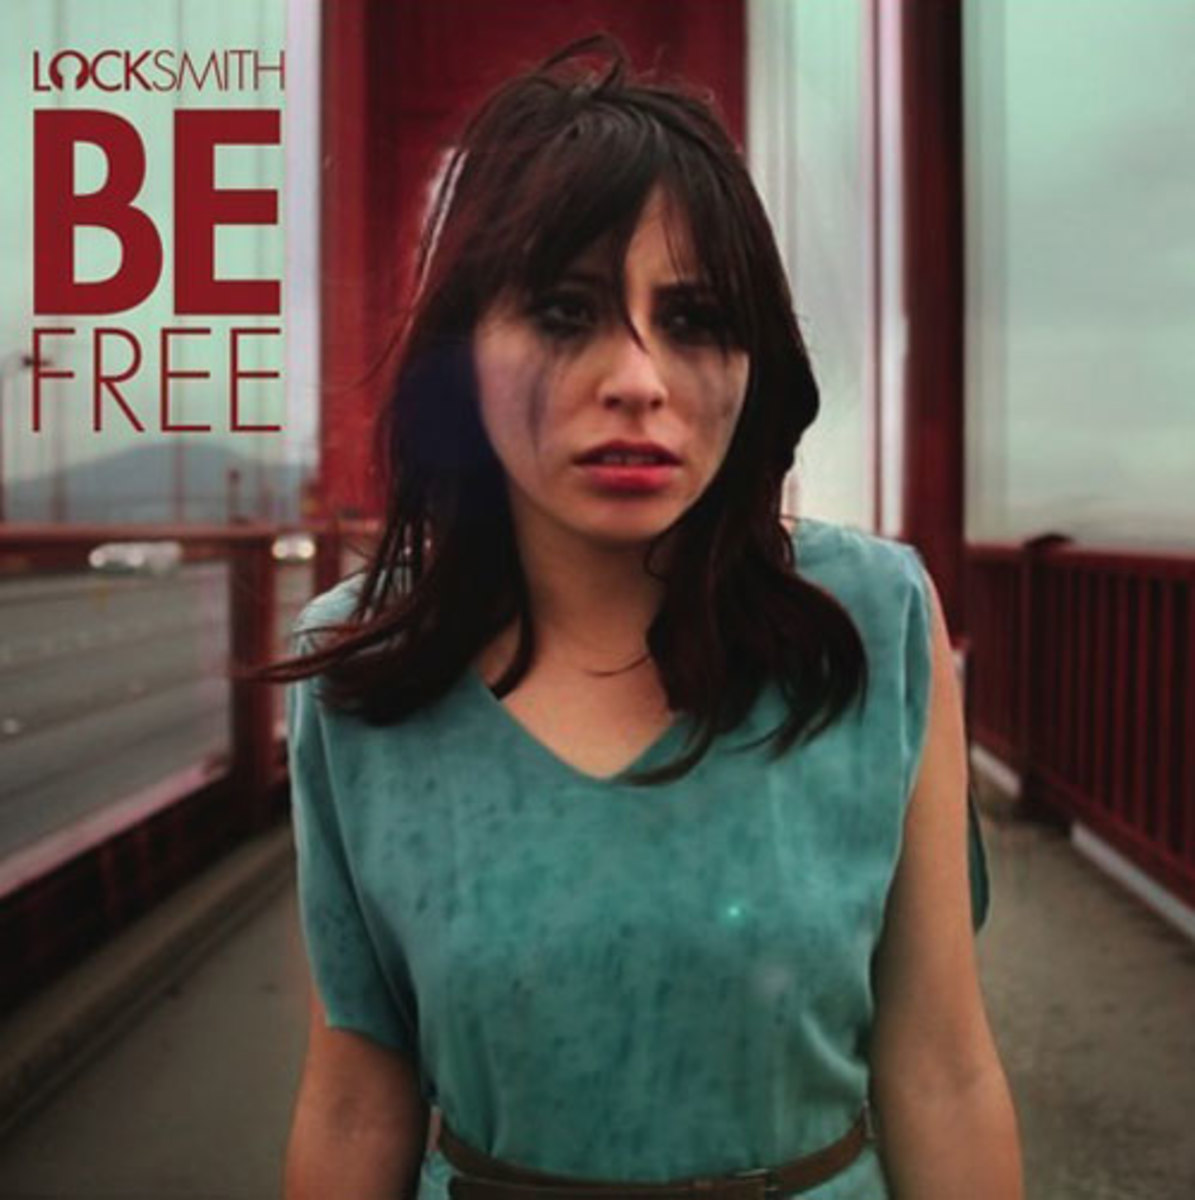 locksmith-befree.jpg